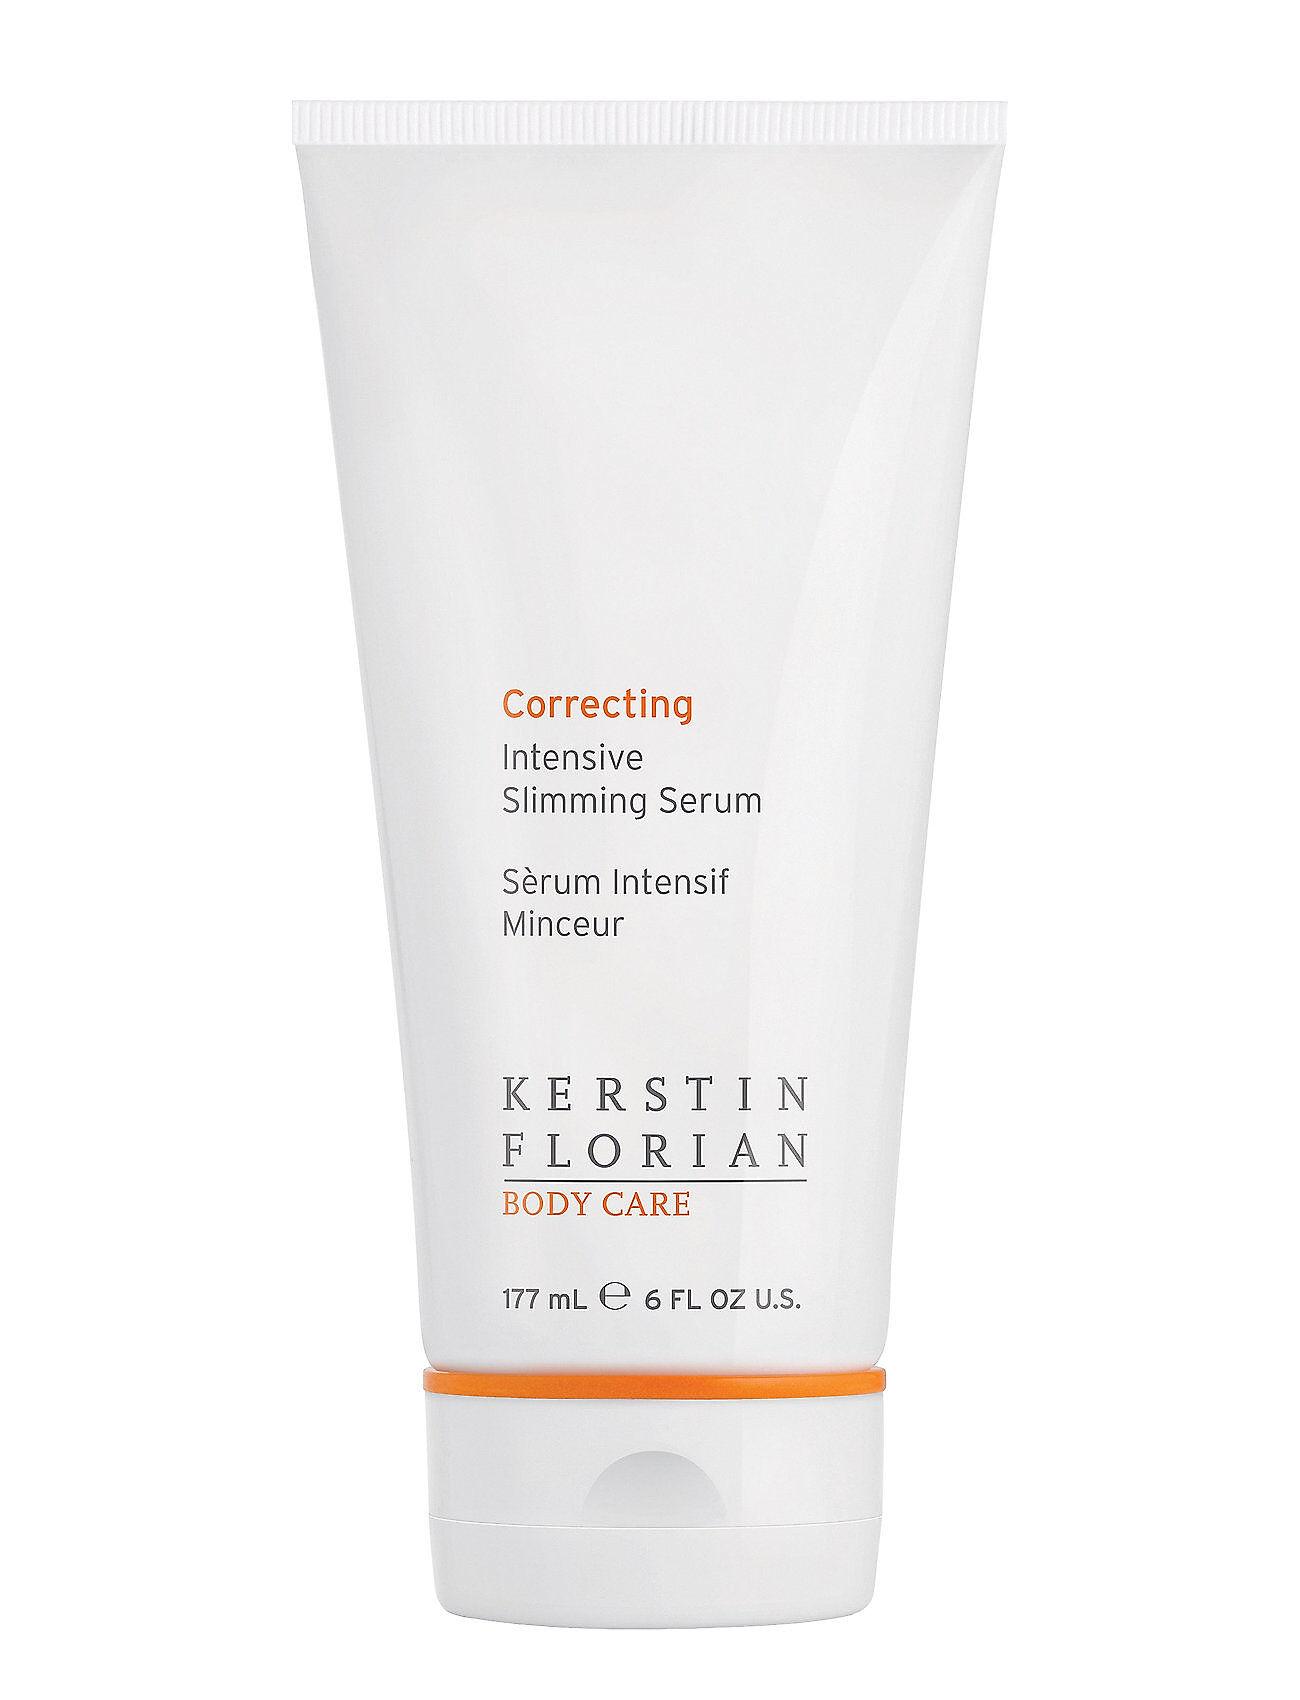 Kerstin Florian Correcting Intensive Slimming Serum